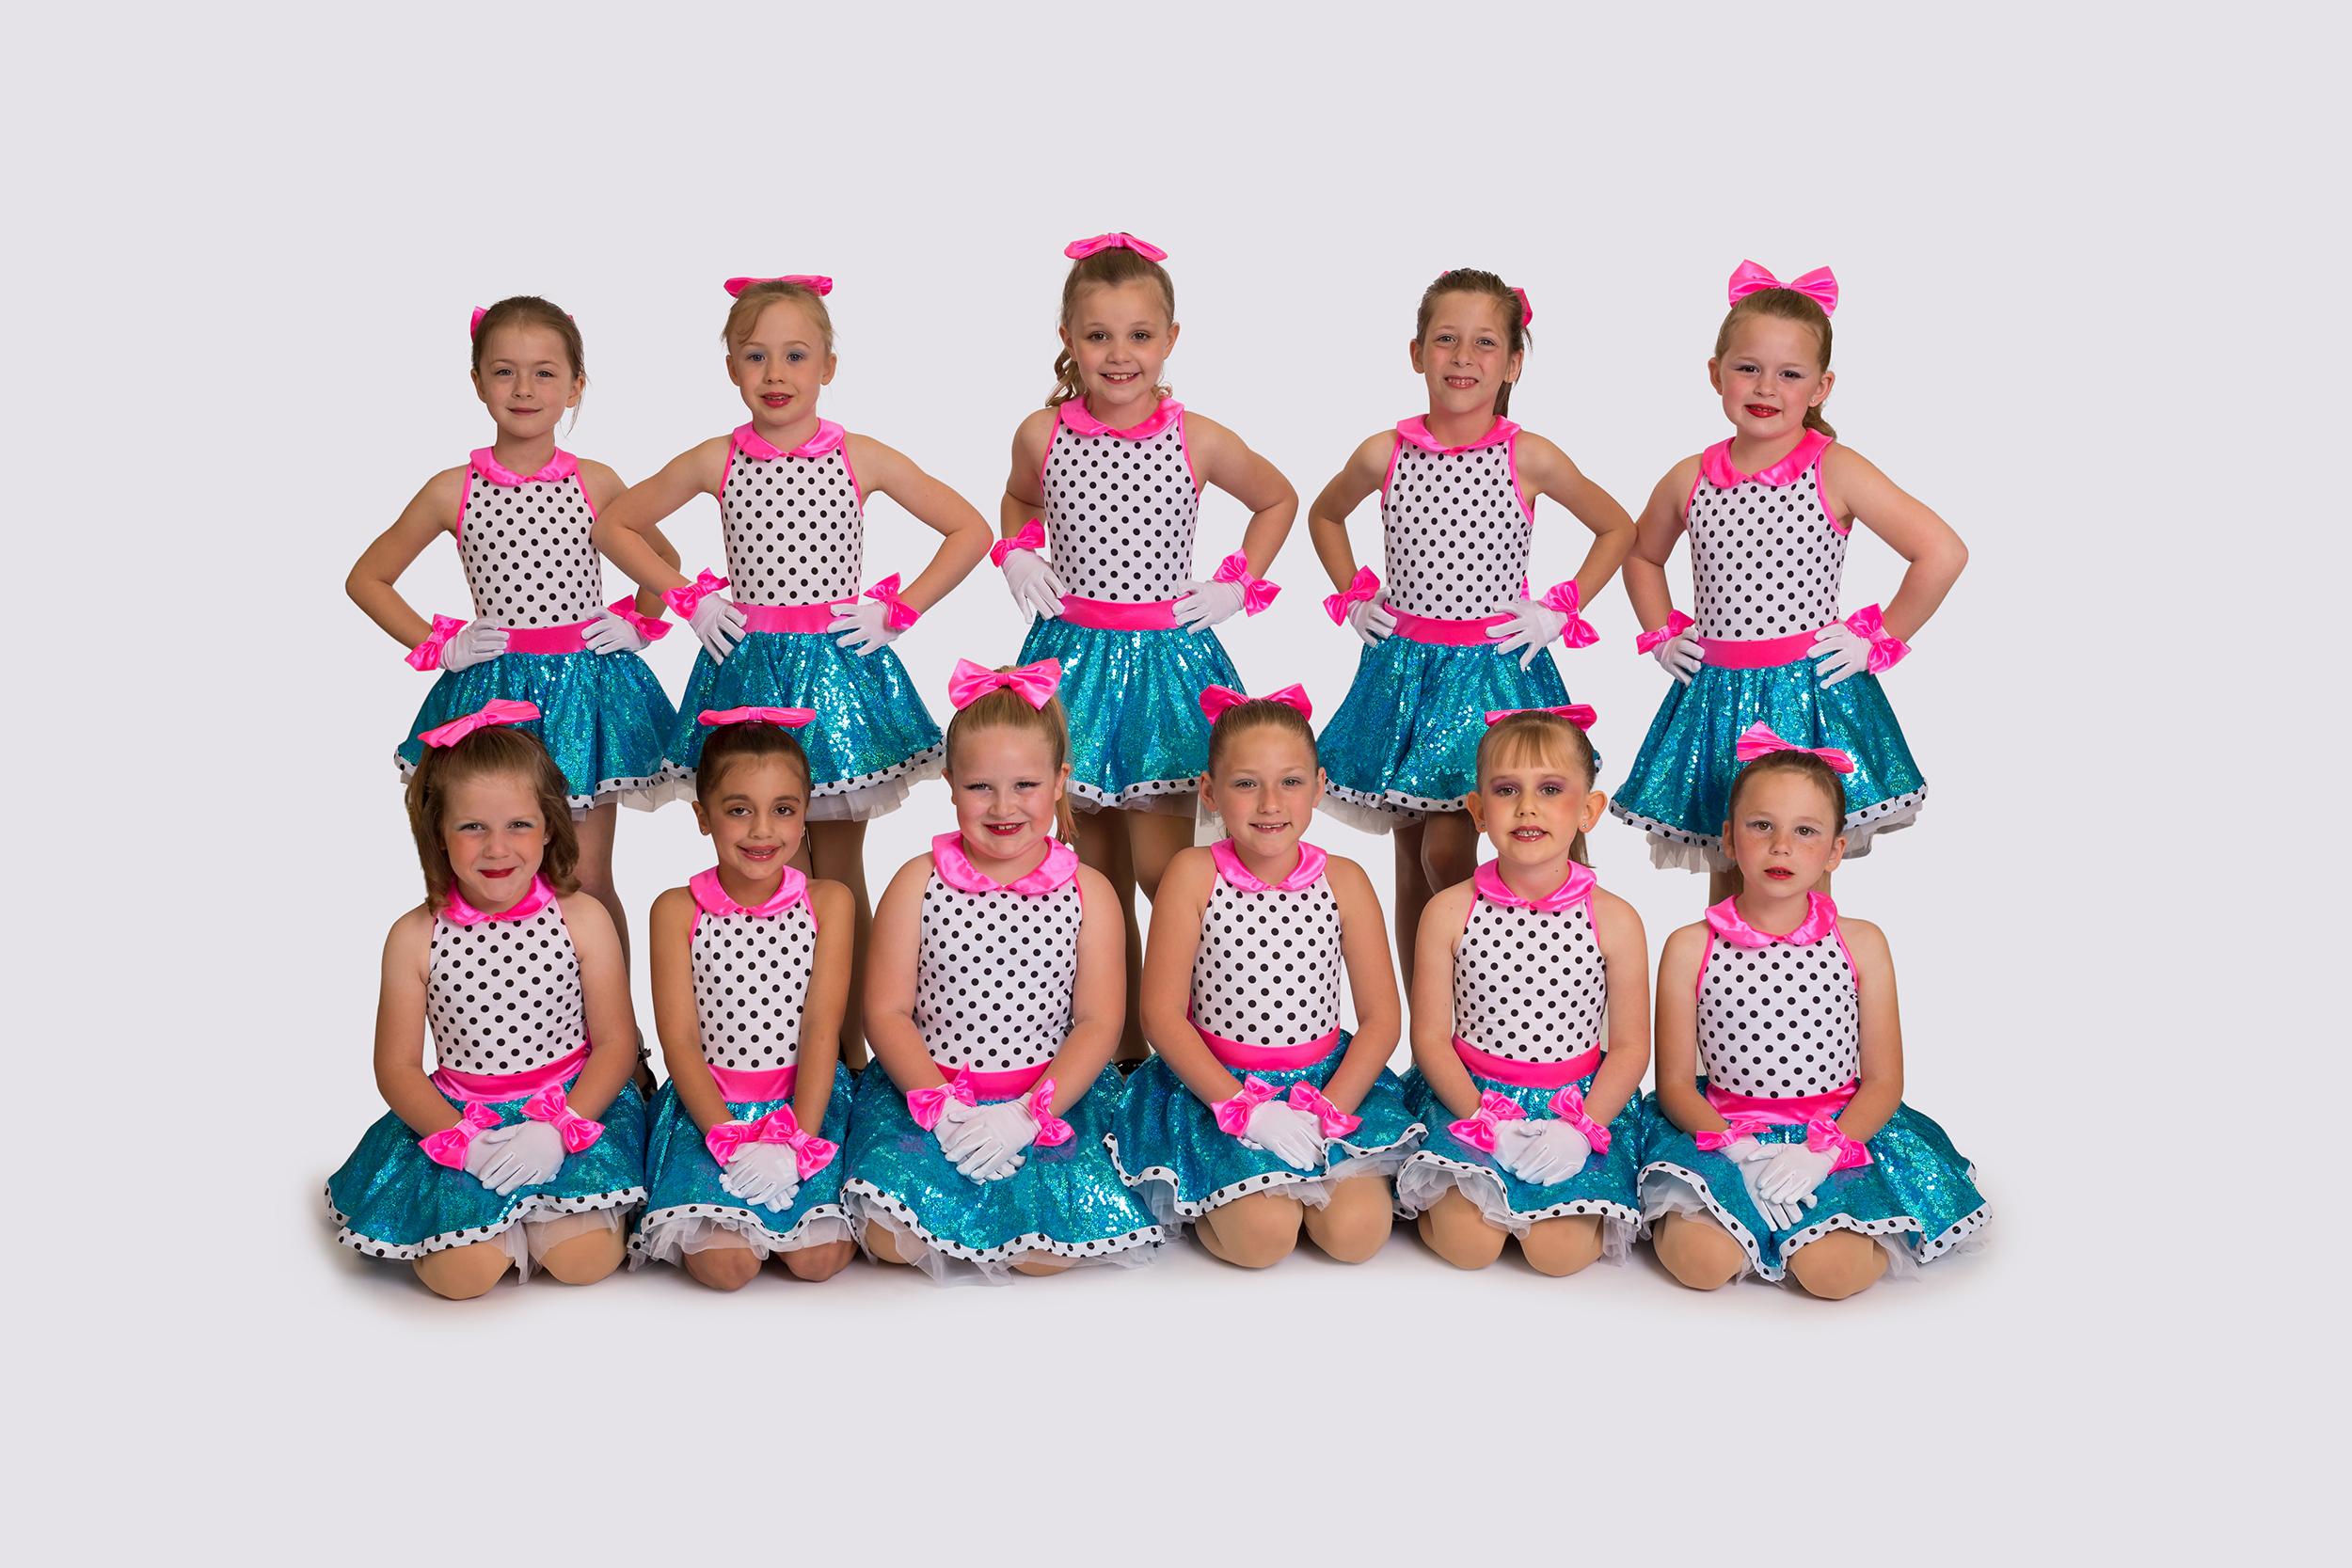 Girls-dance-tap-group.jpg